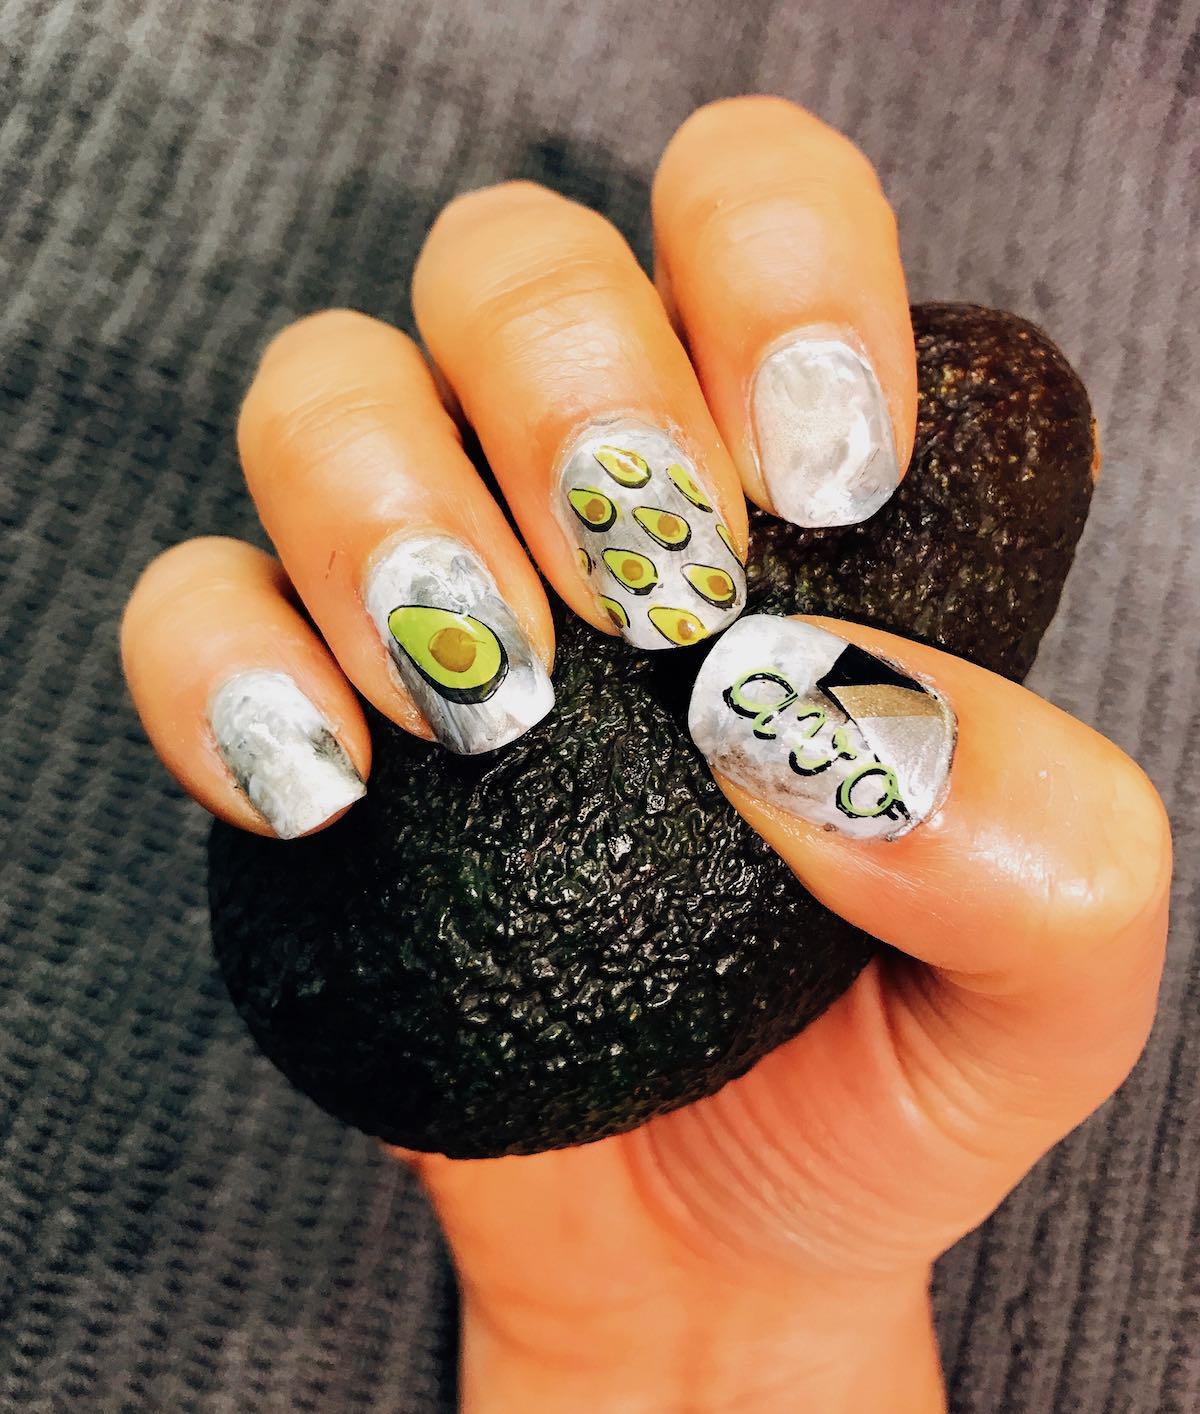 Nail art avocado